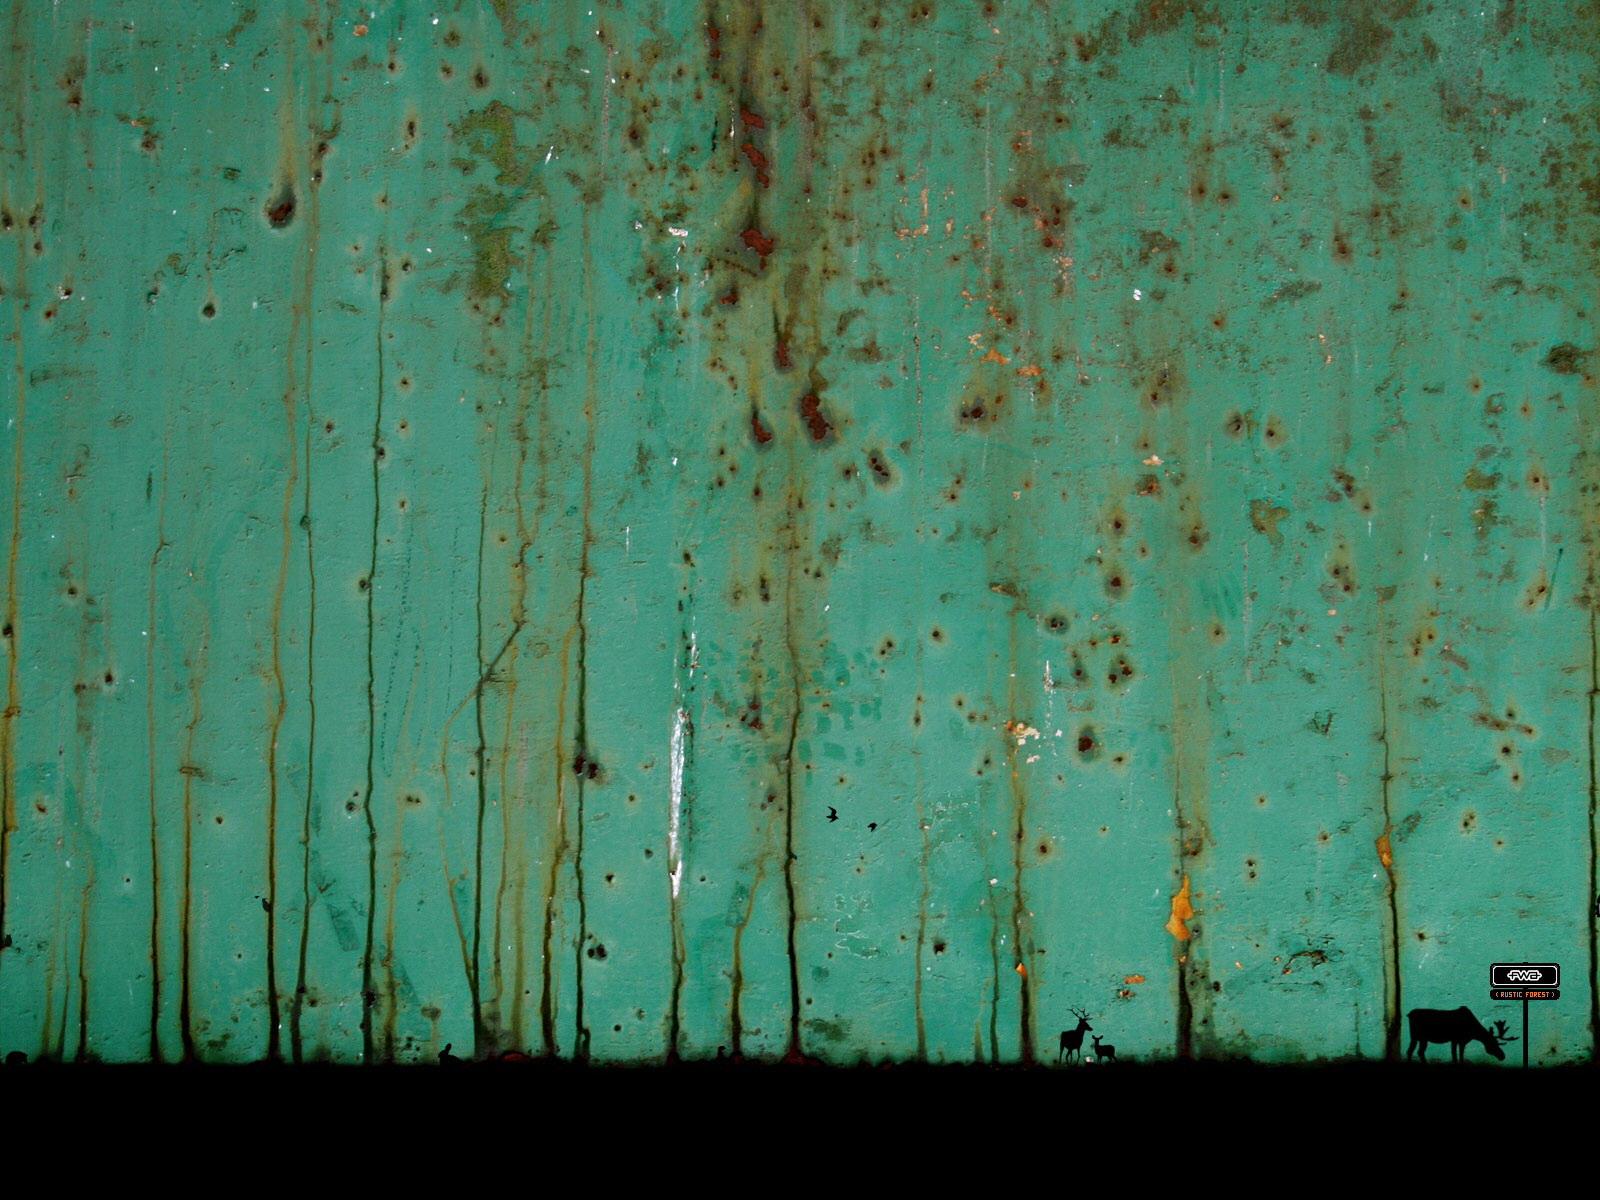 Psychedelic Smoke Wallpaper High Resolution Wallpa...